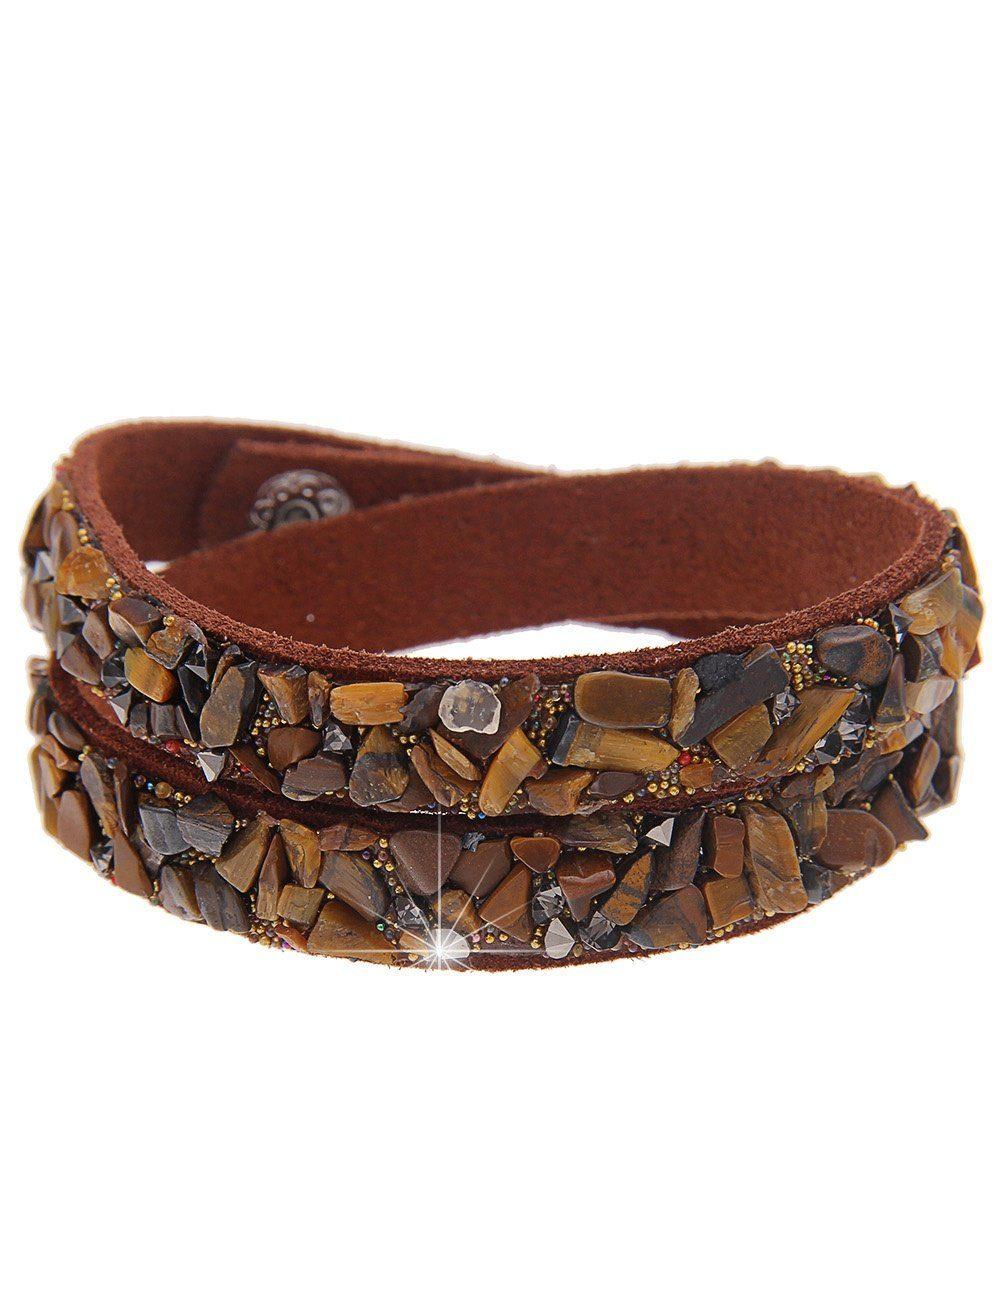 leslii Armband, in Wickel-Optik braun Damen Armband Armbänder Schmuck 4250980346063